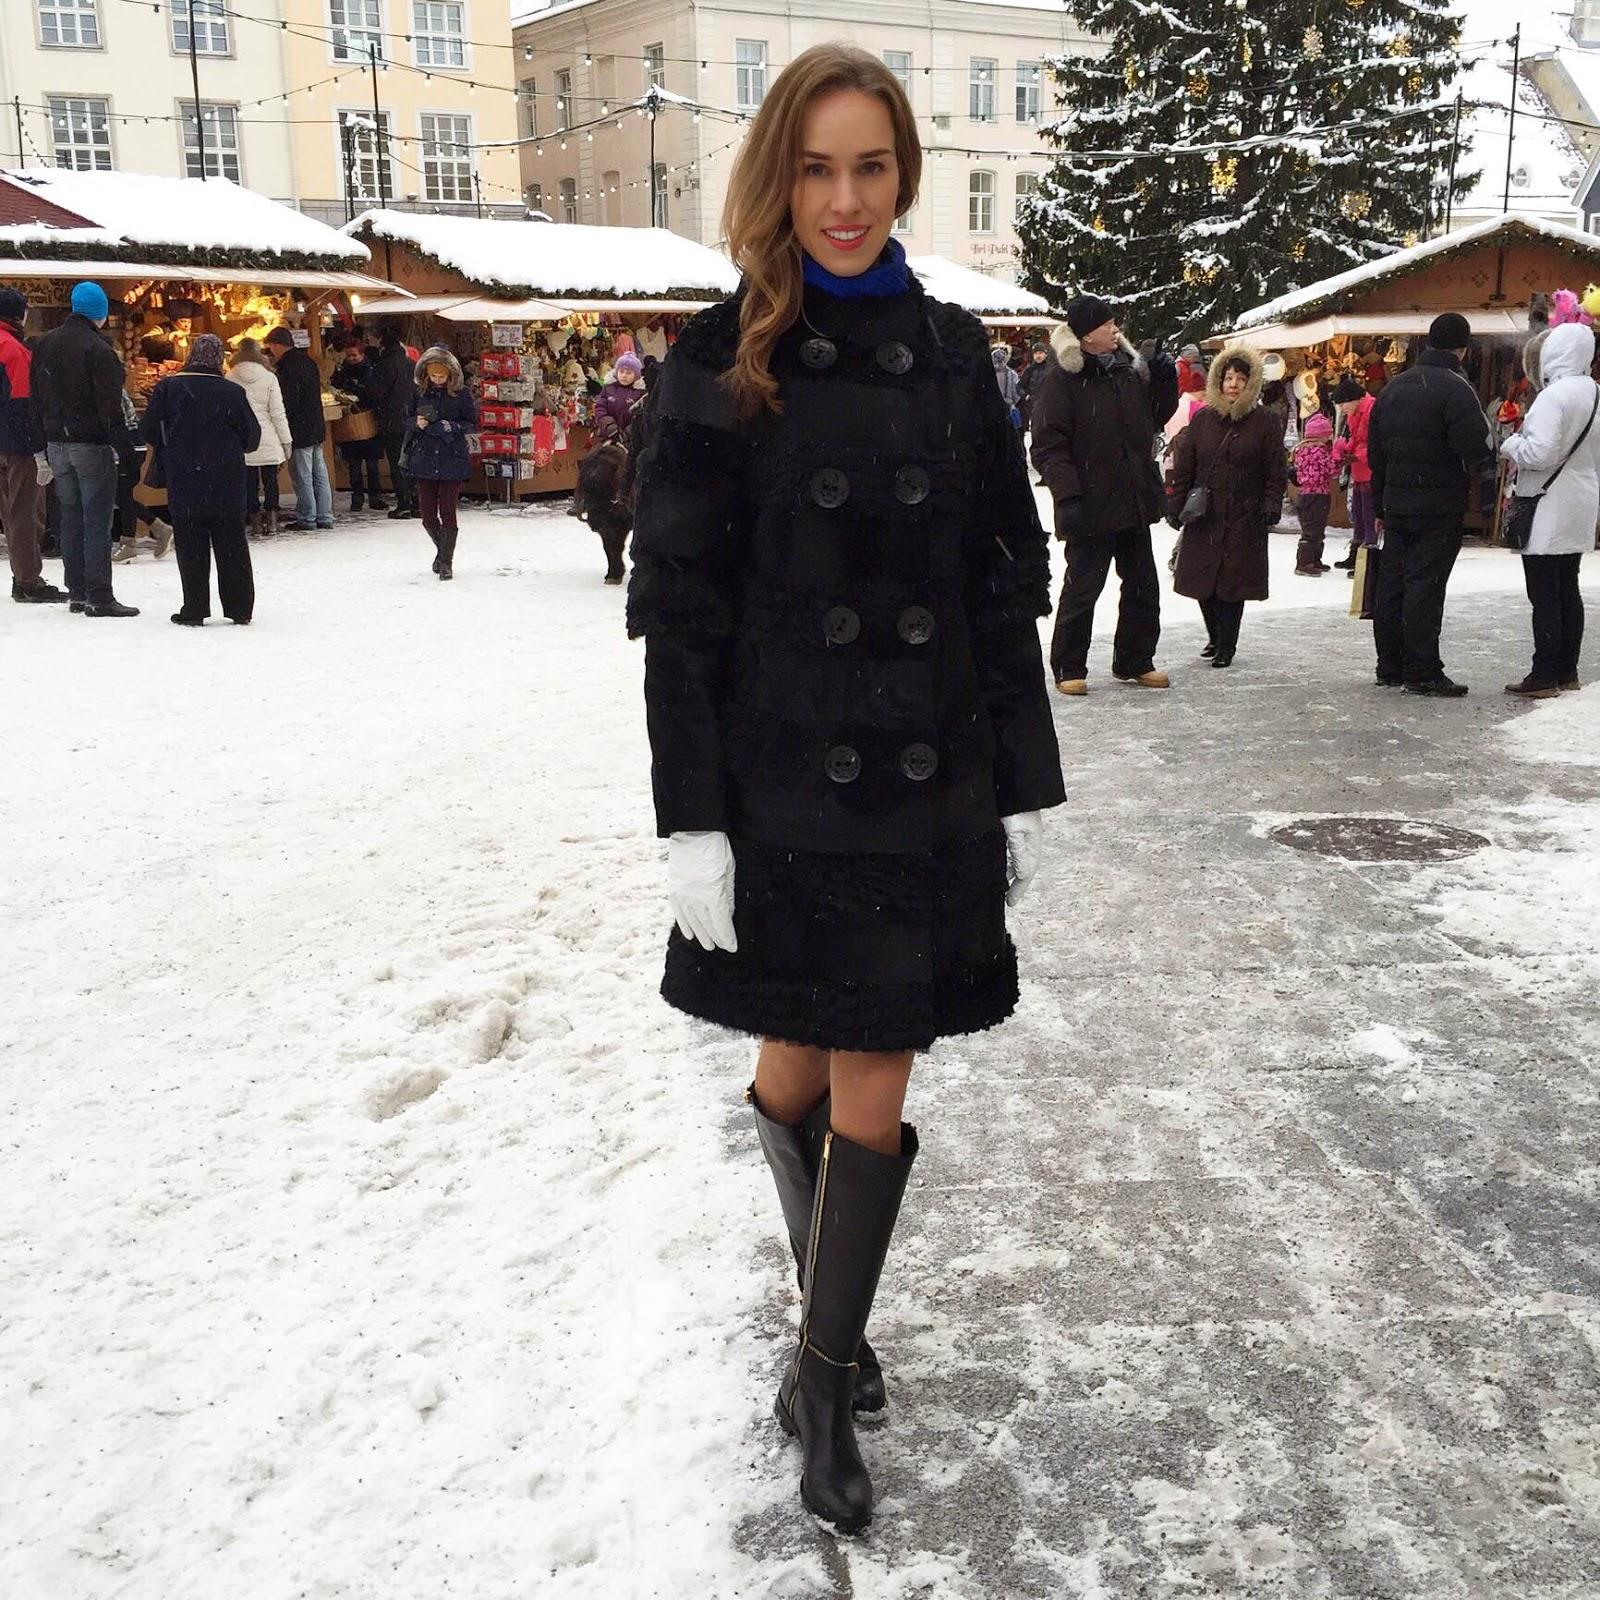 black-fur-coat-snow-christmas-market-tallinn